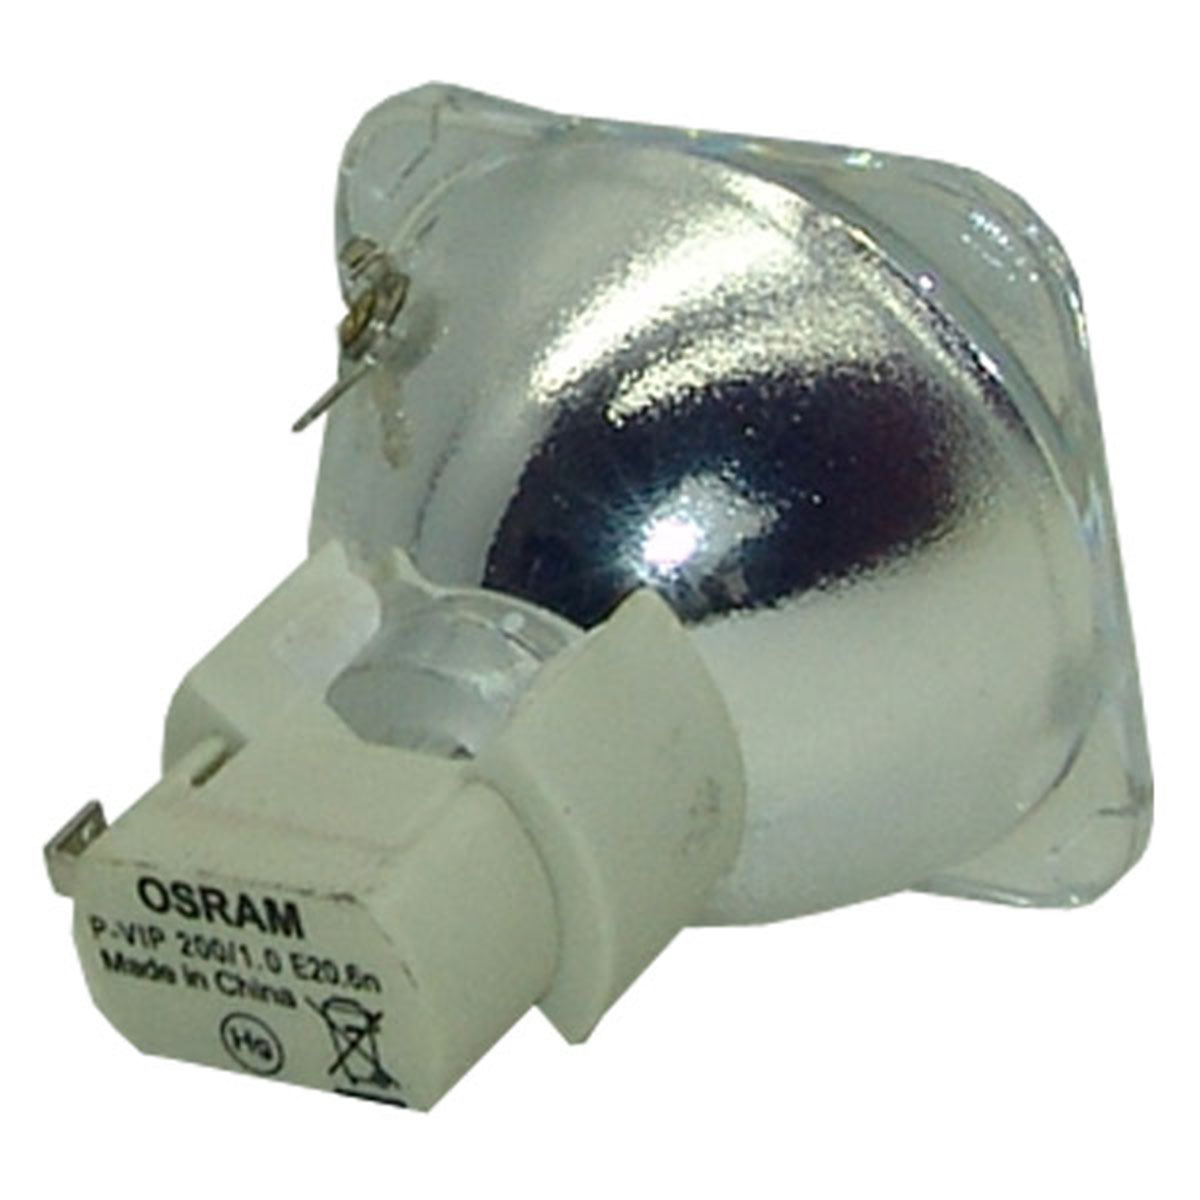 Original Osram Projector Lamp Replacement with Housing for BenQ 5J.J9V05.001 - image 1 de 5